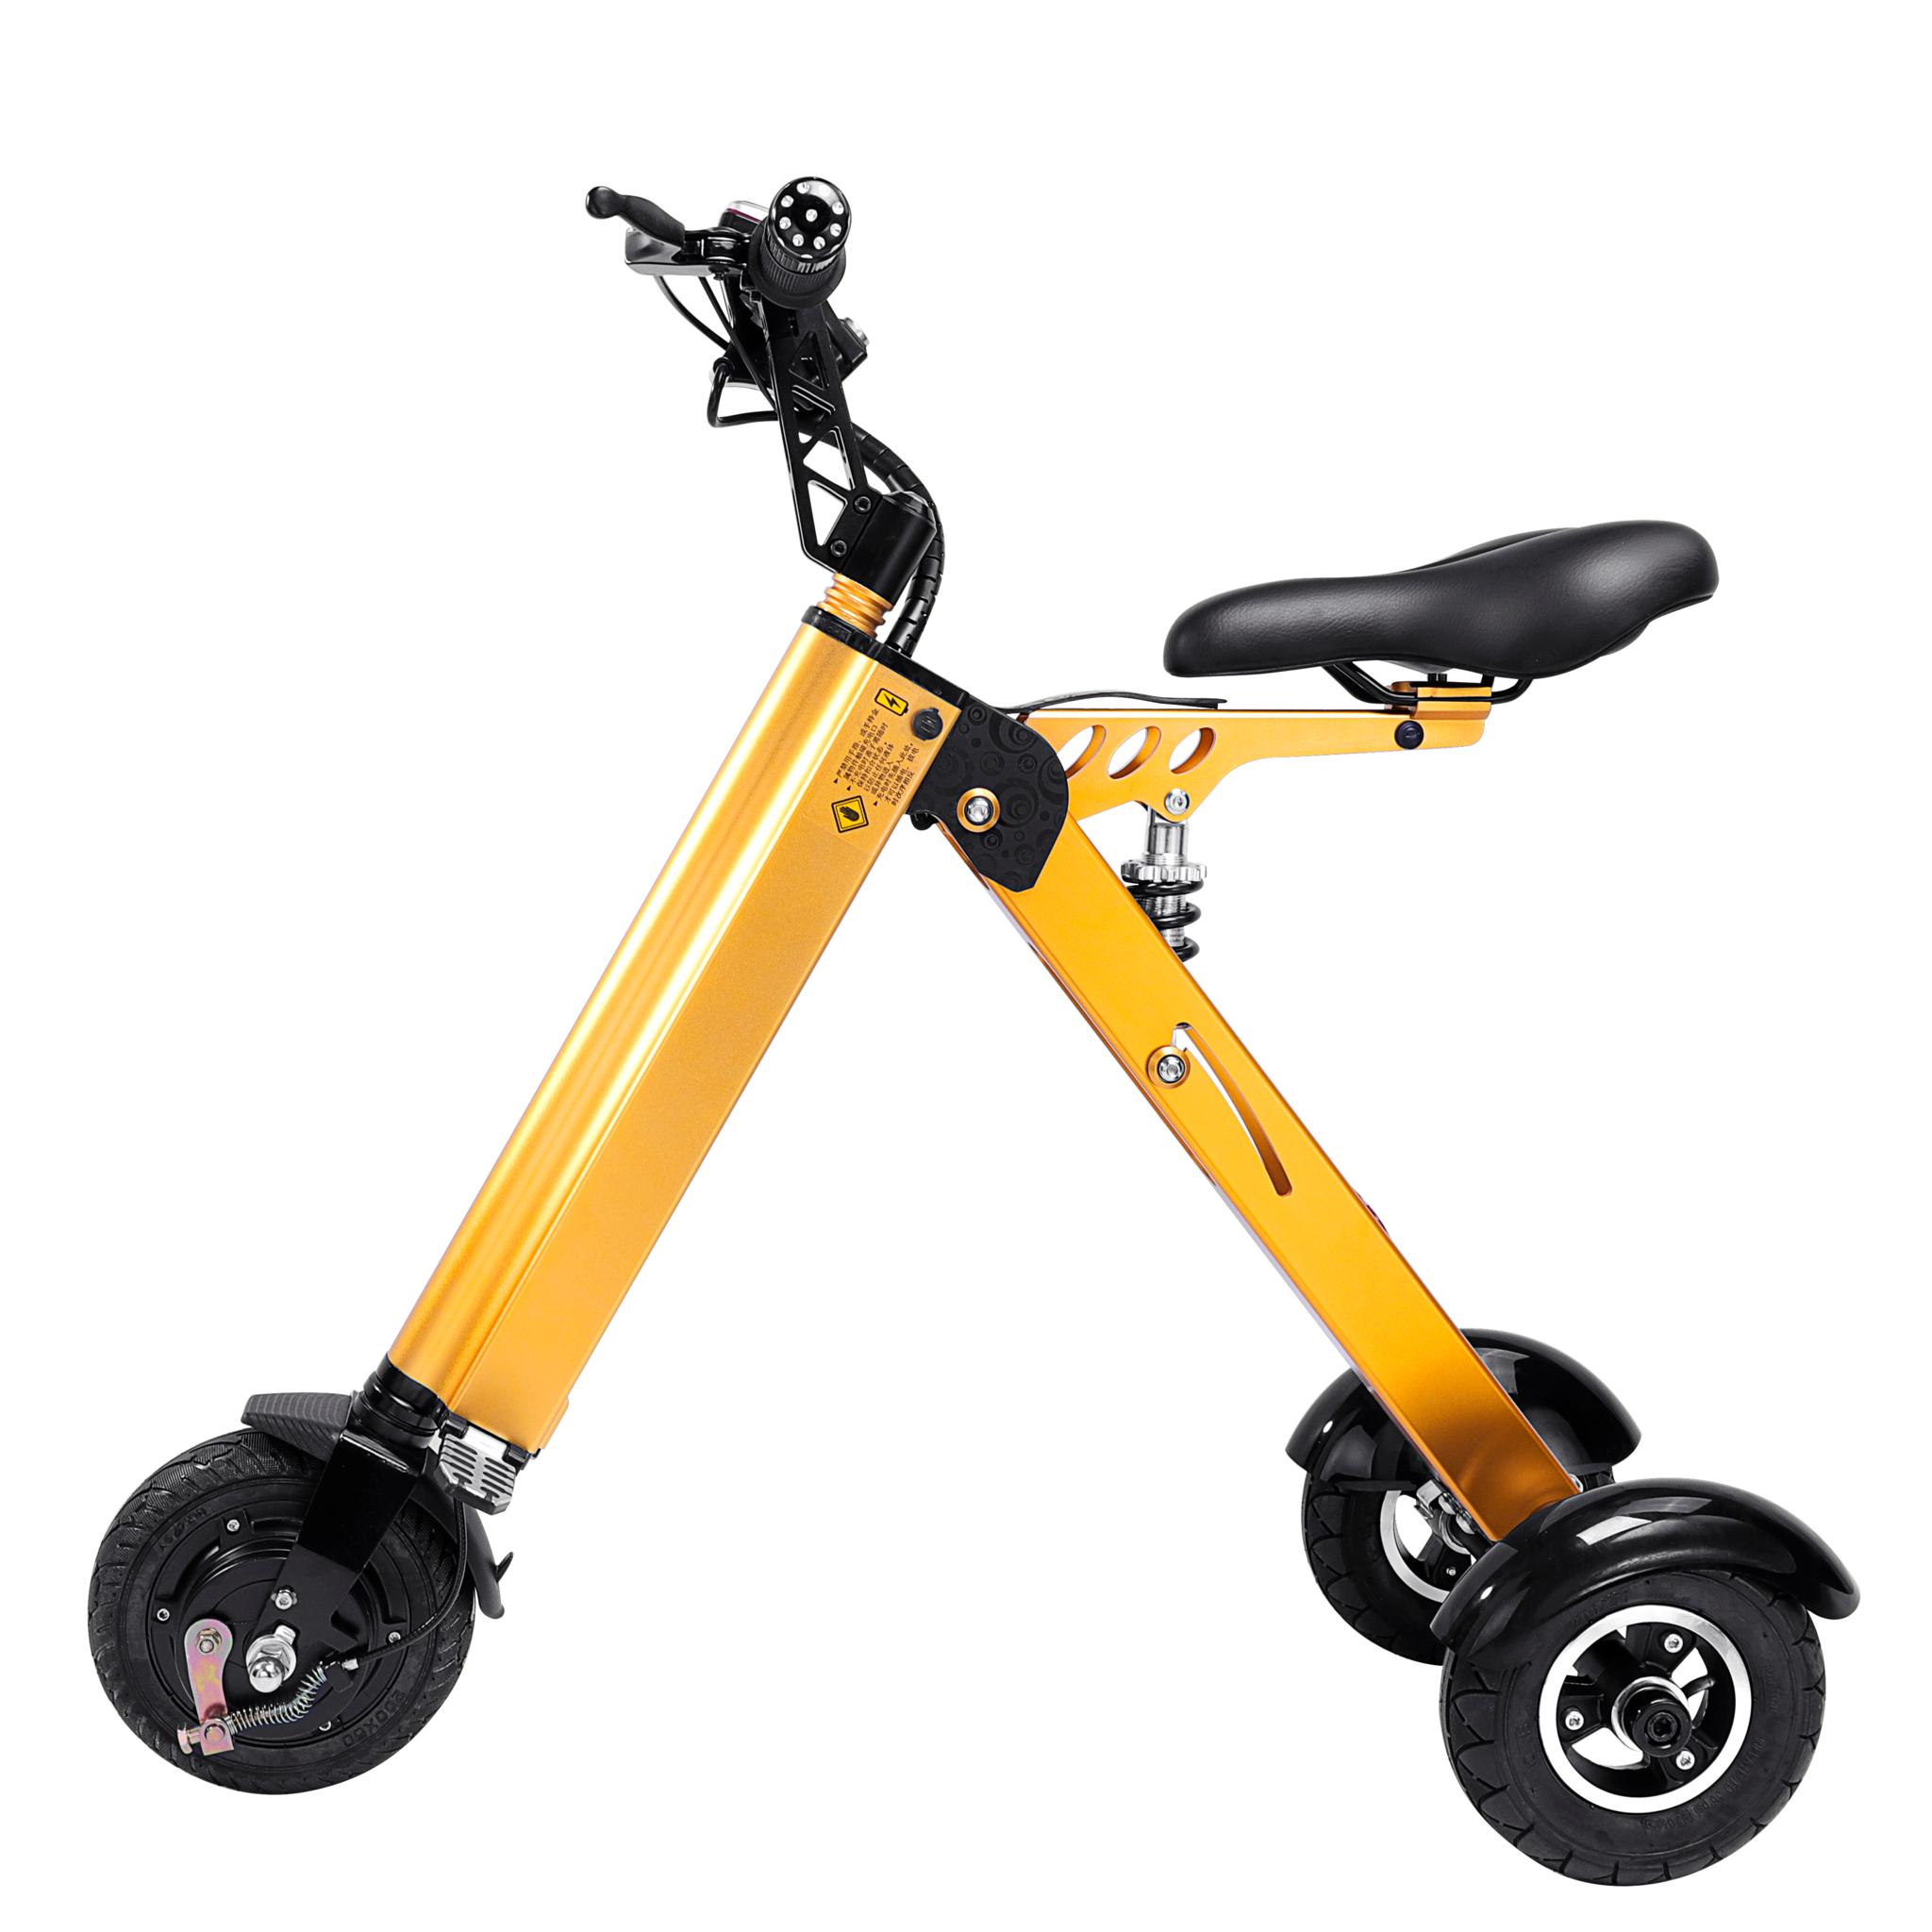 Ultra-light Electric Folding Smart e Scooter - 250W - 8 inch - 3 wheels - Pearl gold